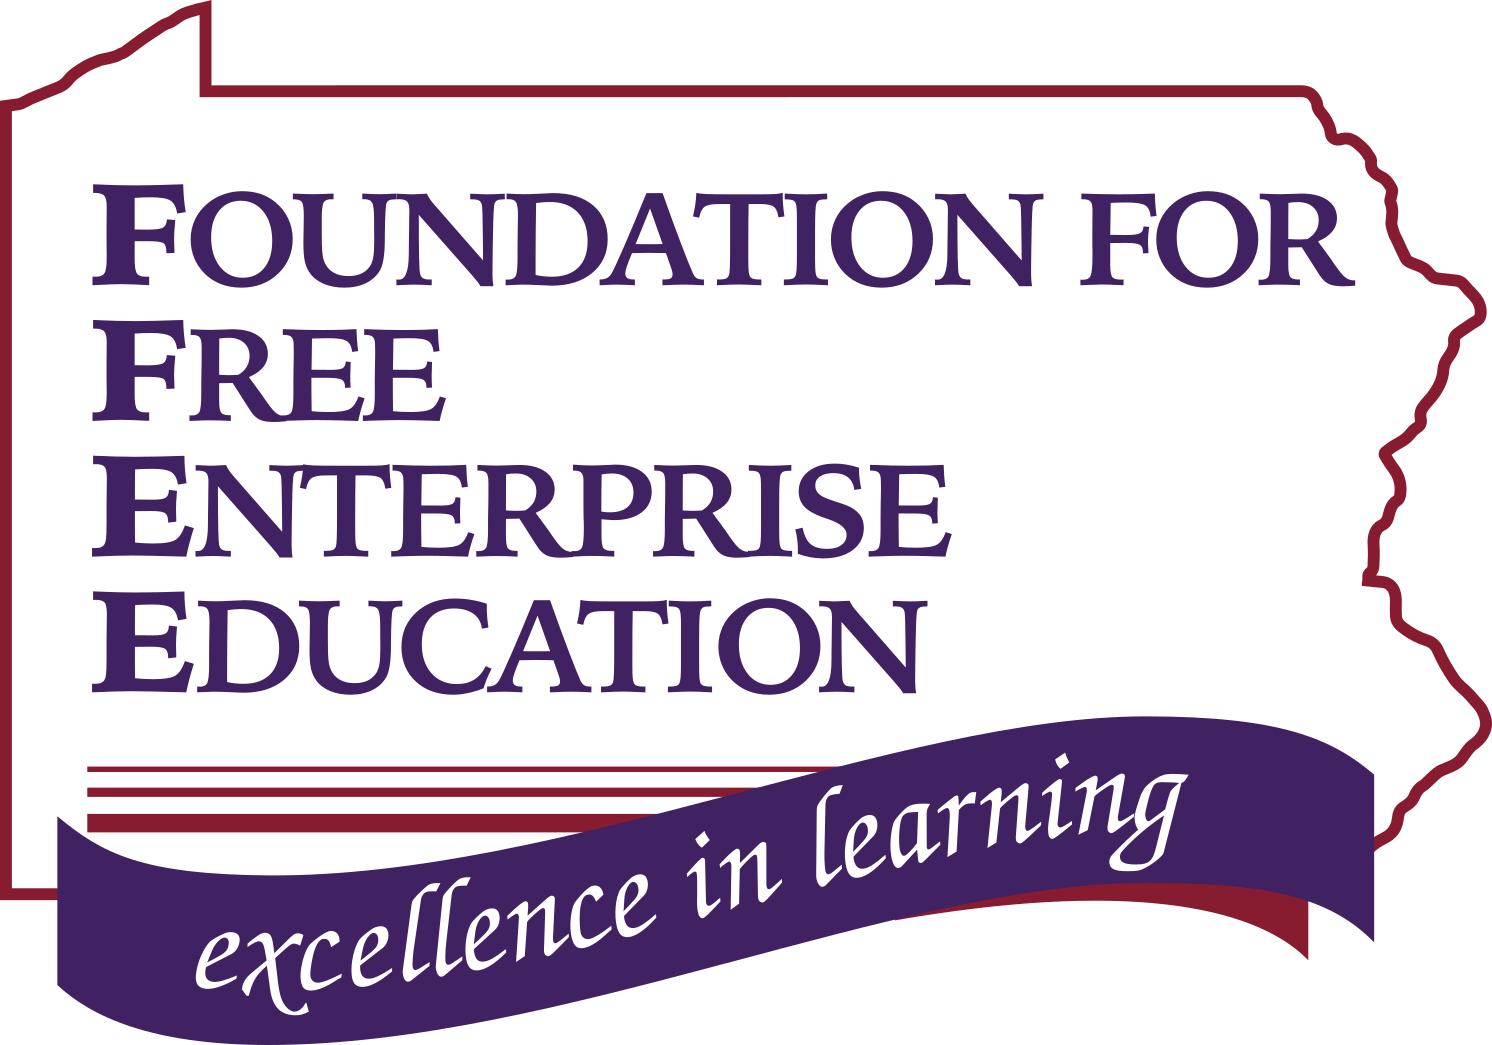 Foundation for Free Enterprise Education